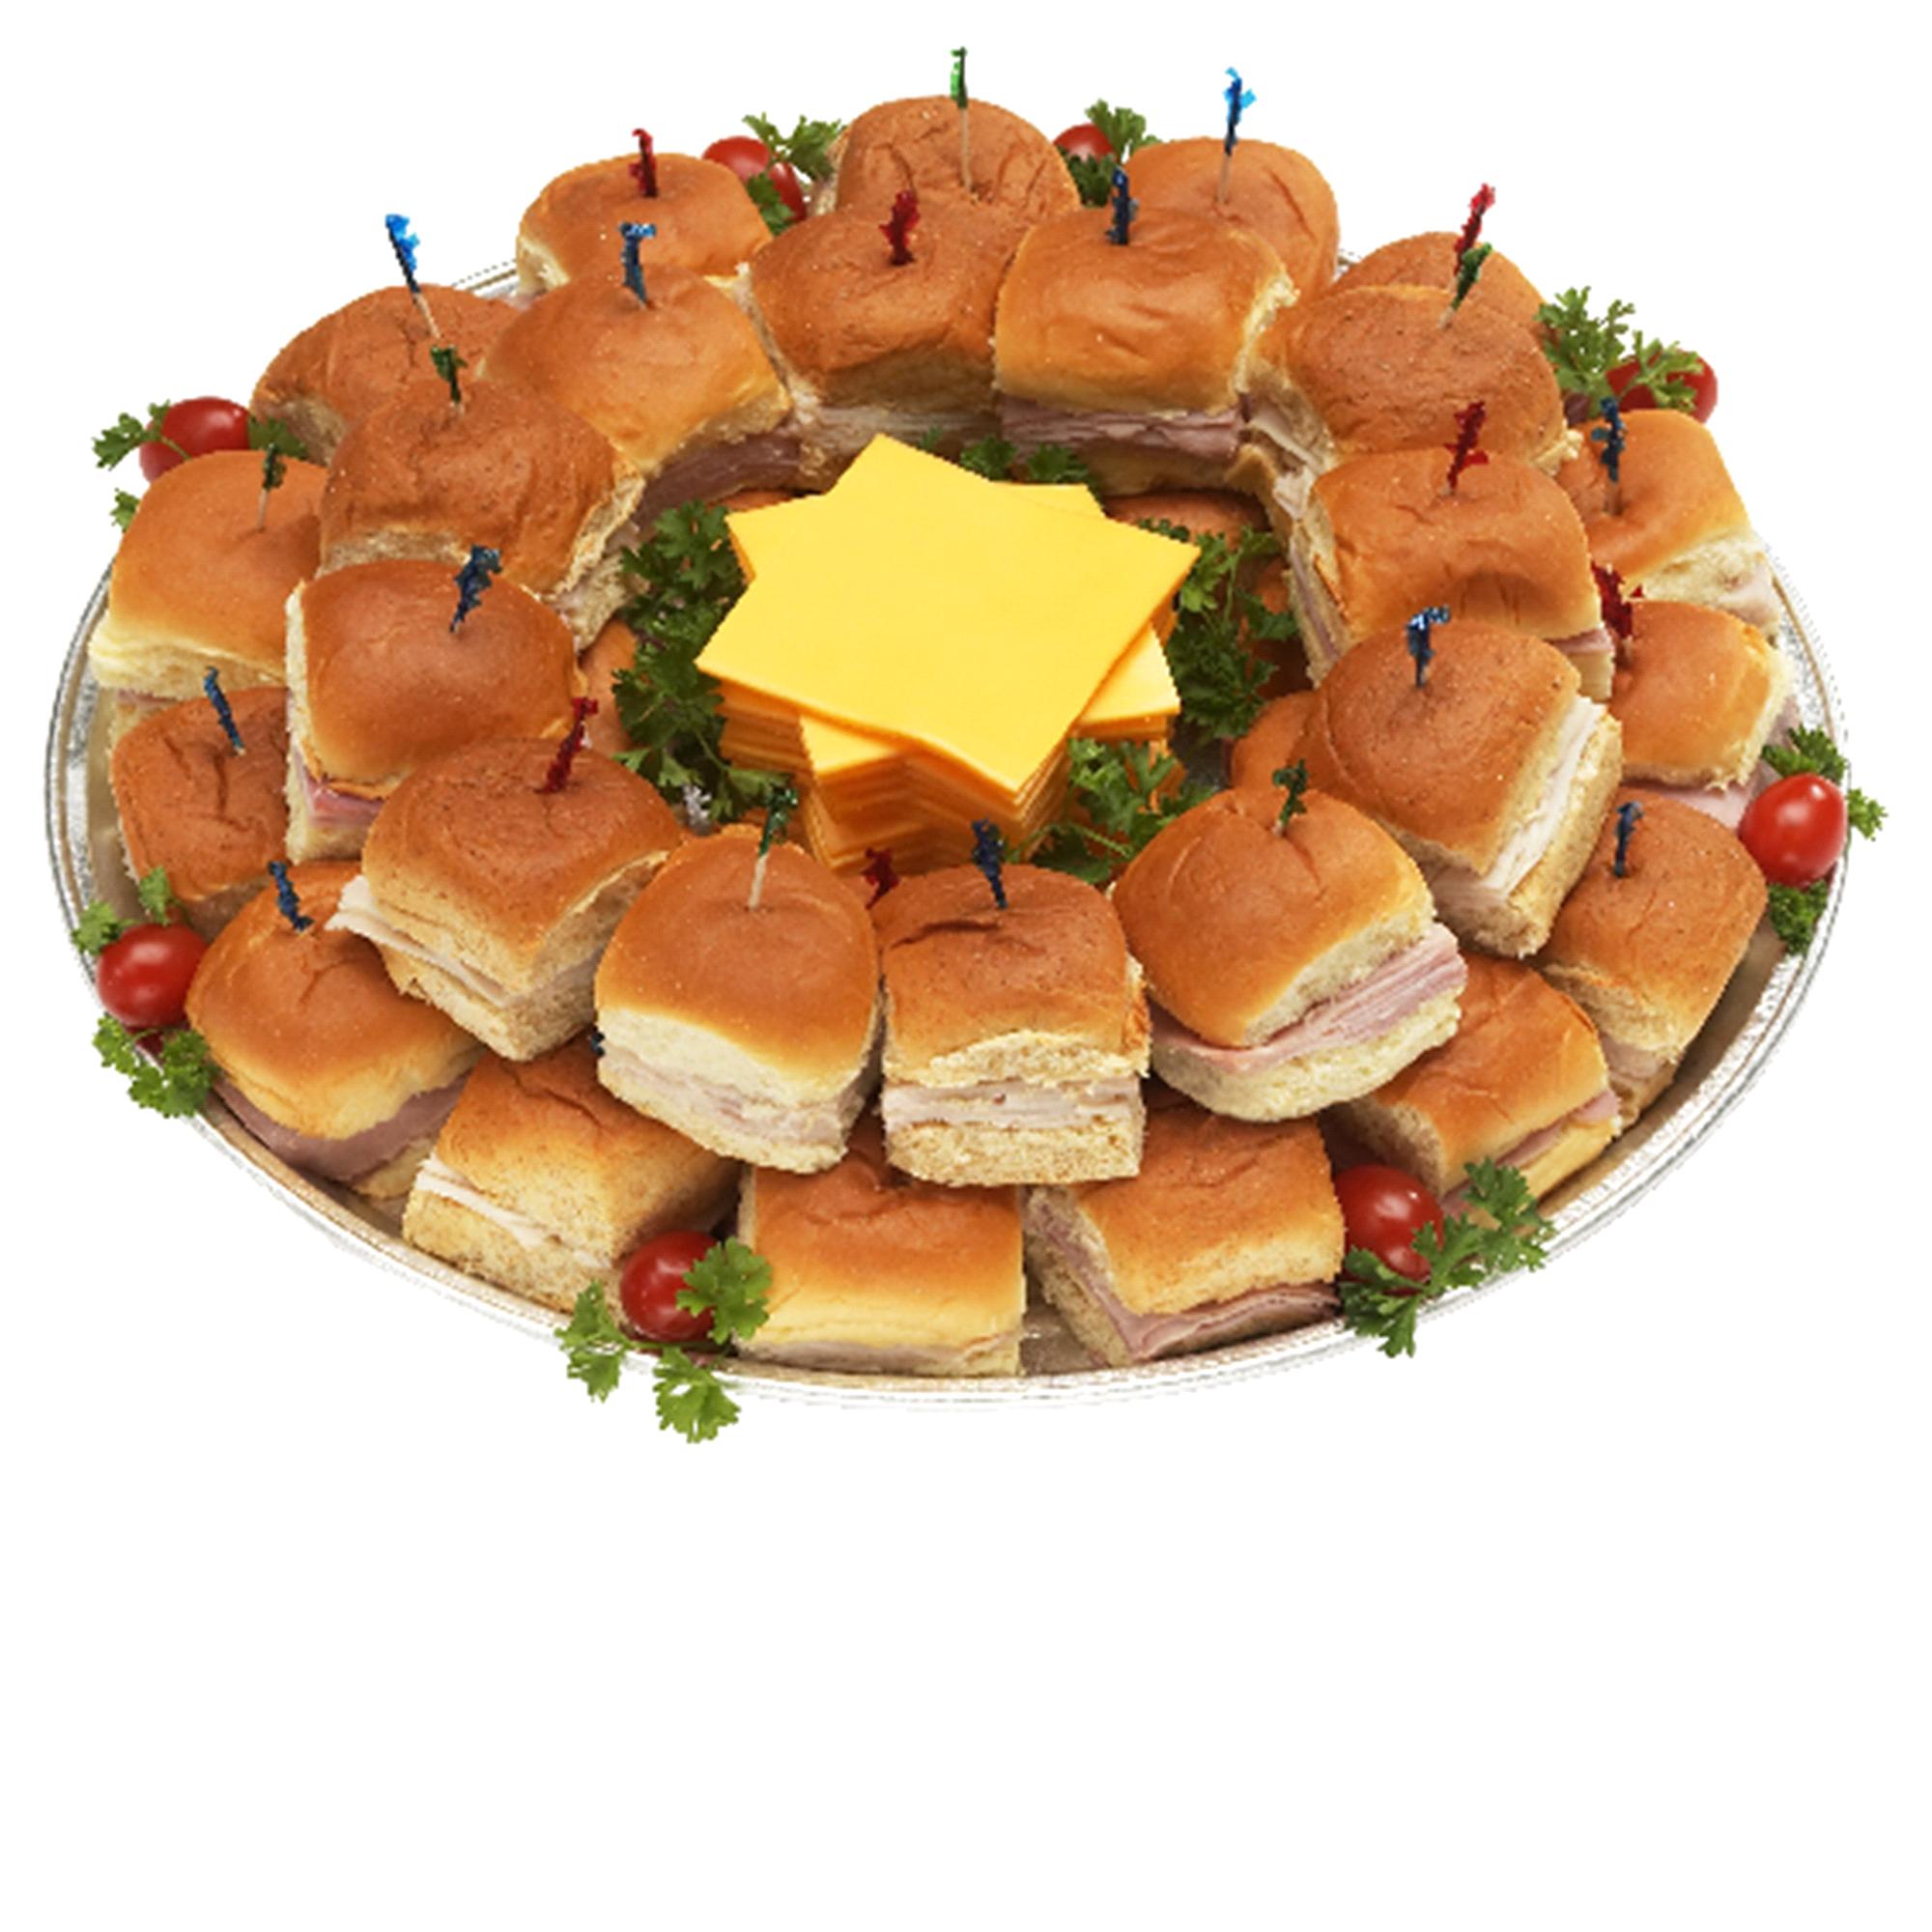 party trays com party trays